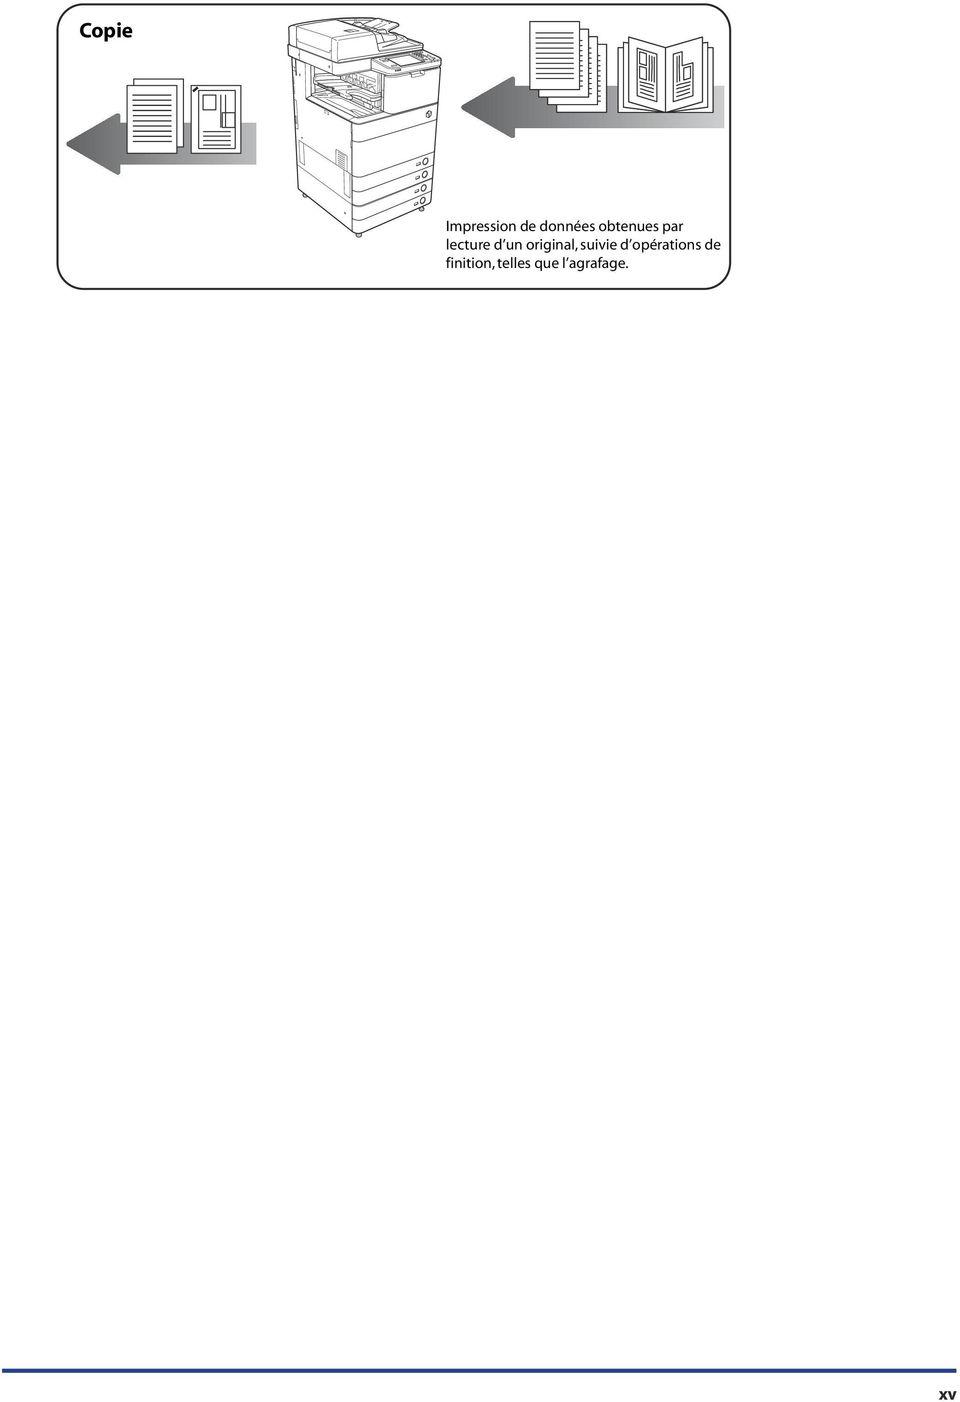 imagerunner ADVANCE C5051/C5051i C5045/C5045i C5035/C5035i